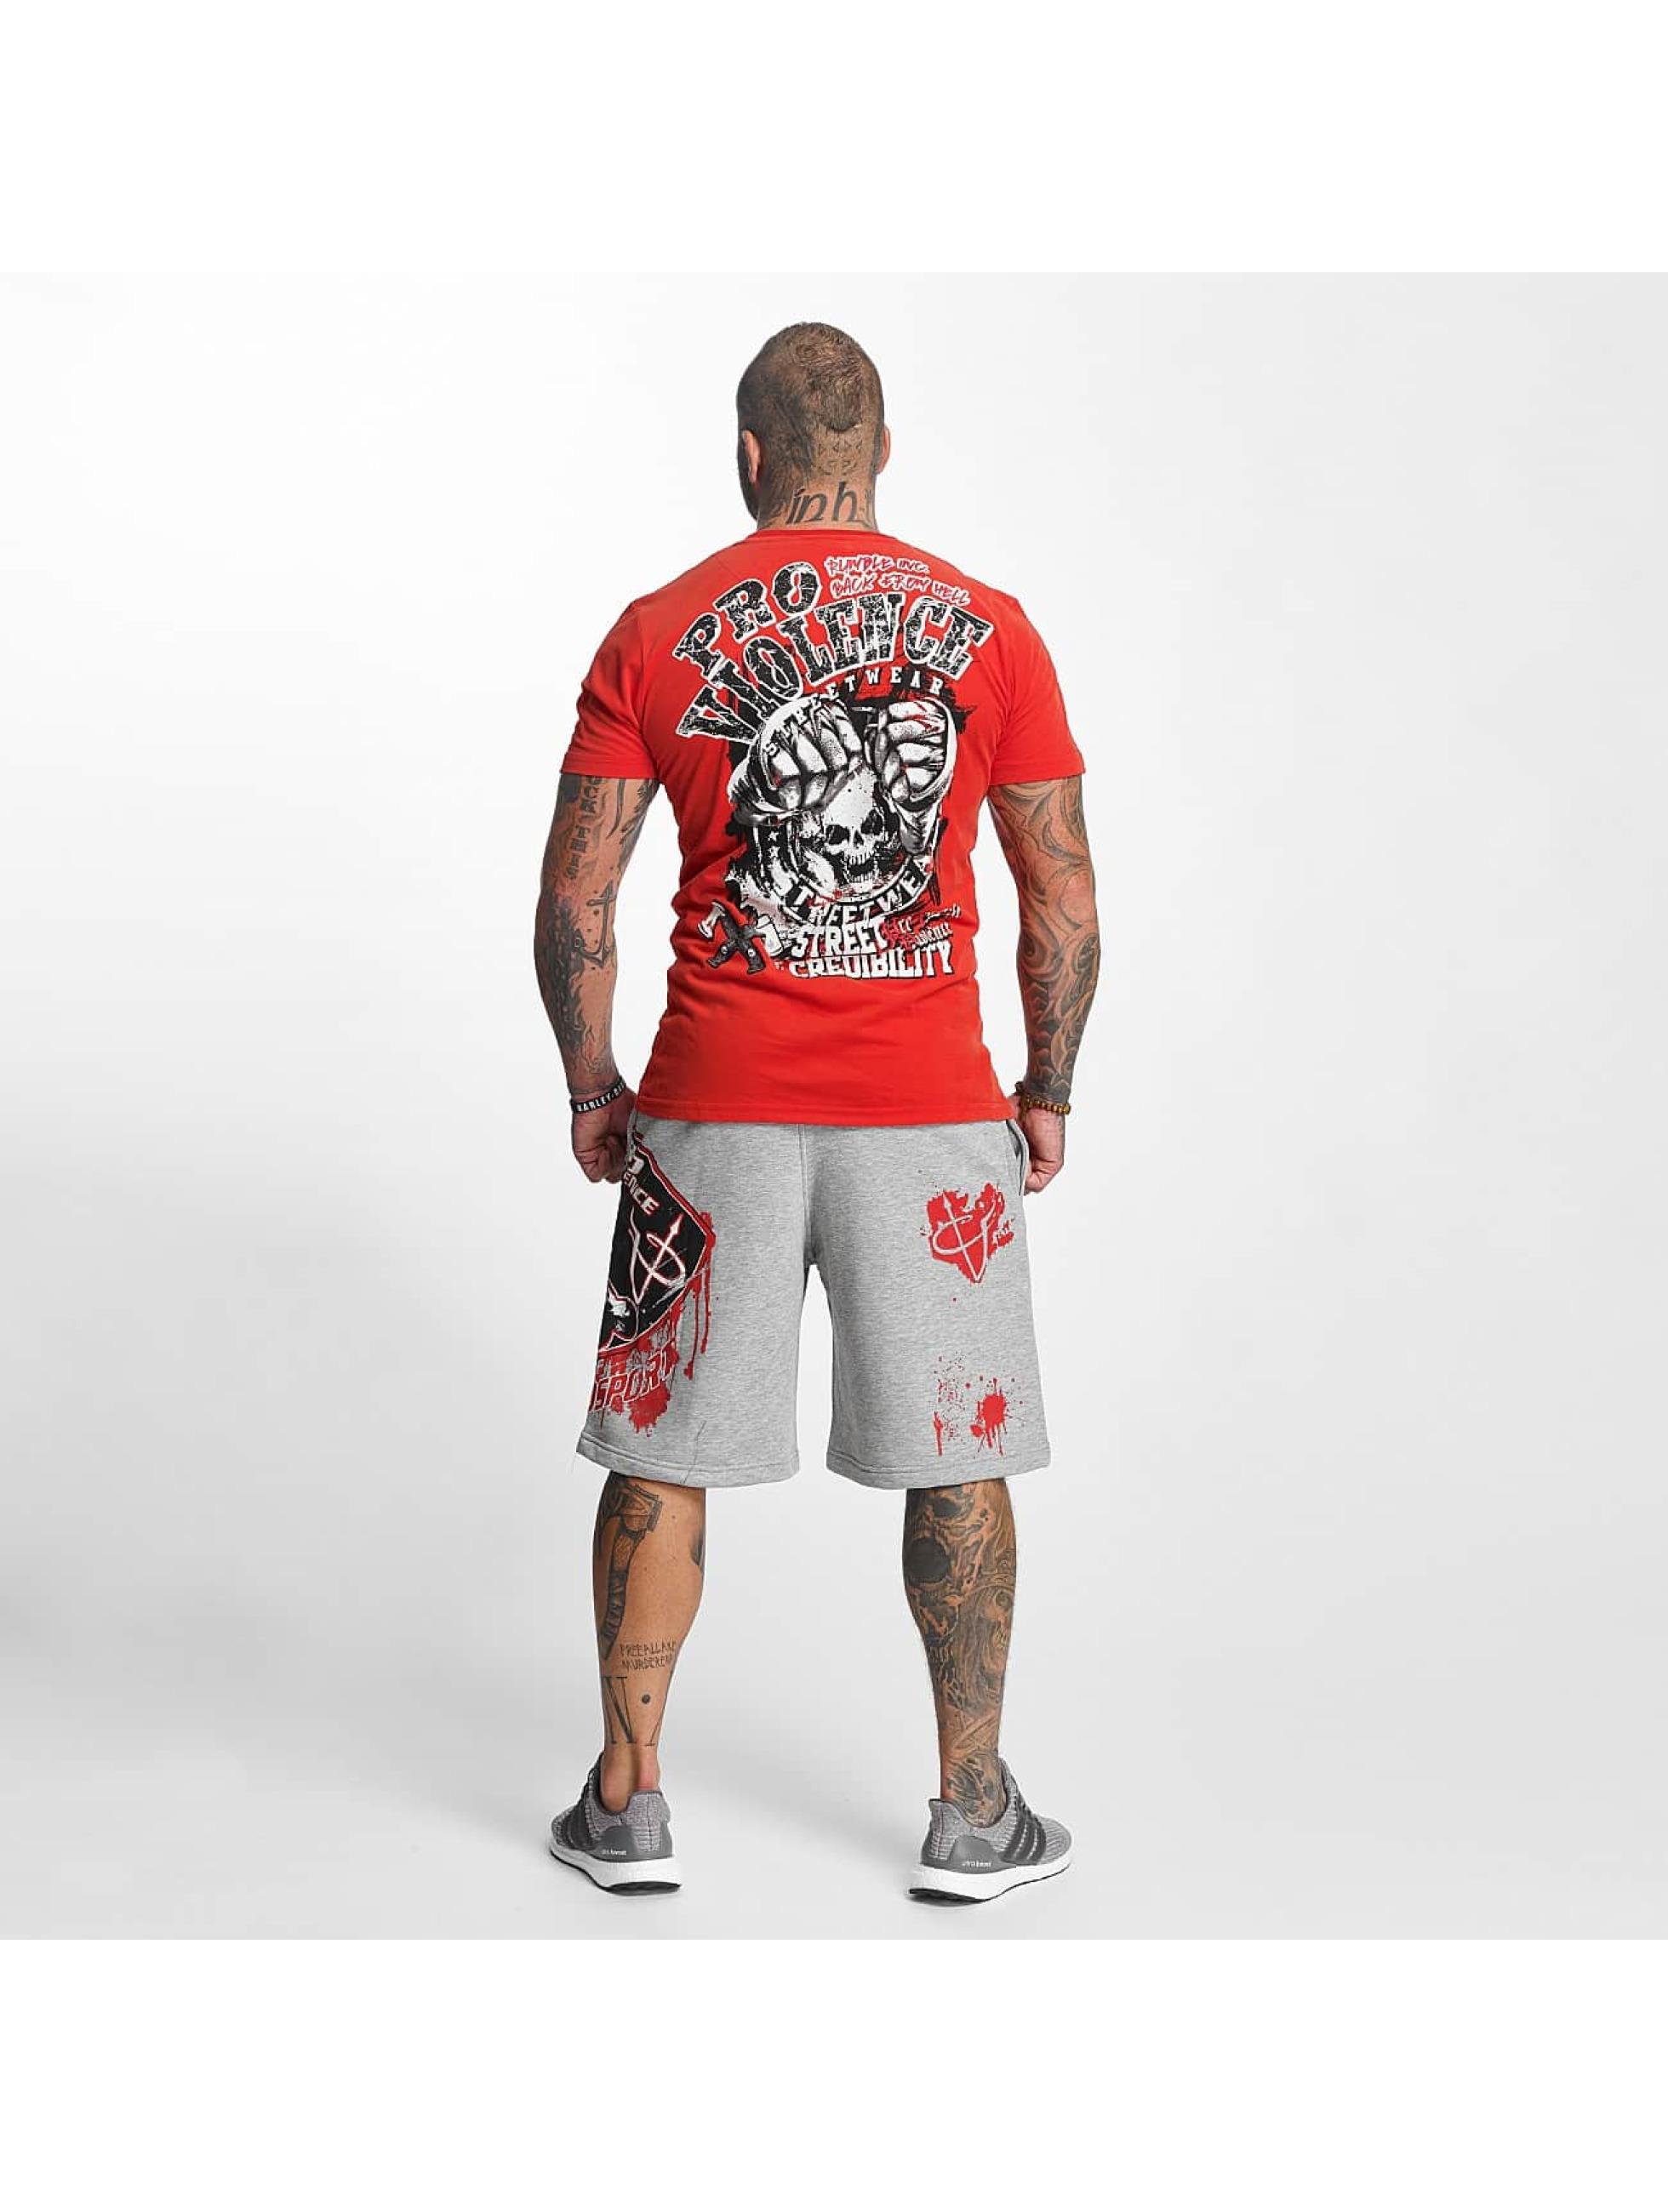 Pro Violence Streetwear t-shirt Street Ceidbilty rood